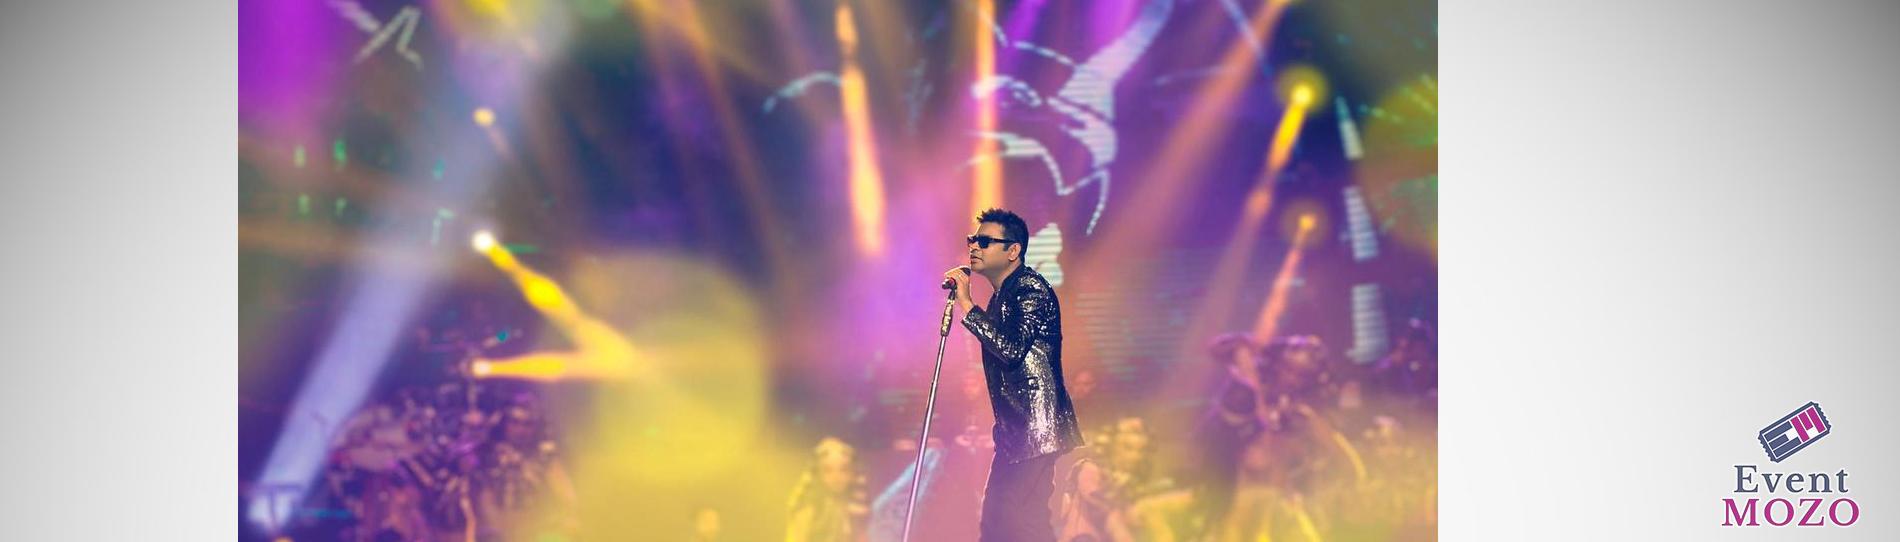 EventMozo A R Rahman Live in Concert 2018, Washington DC